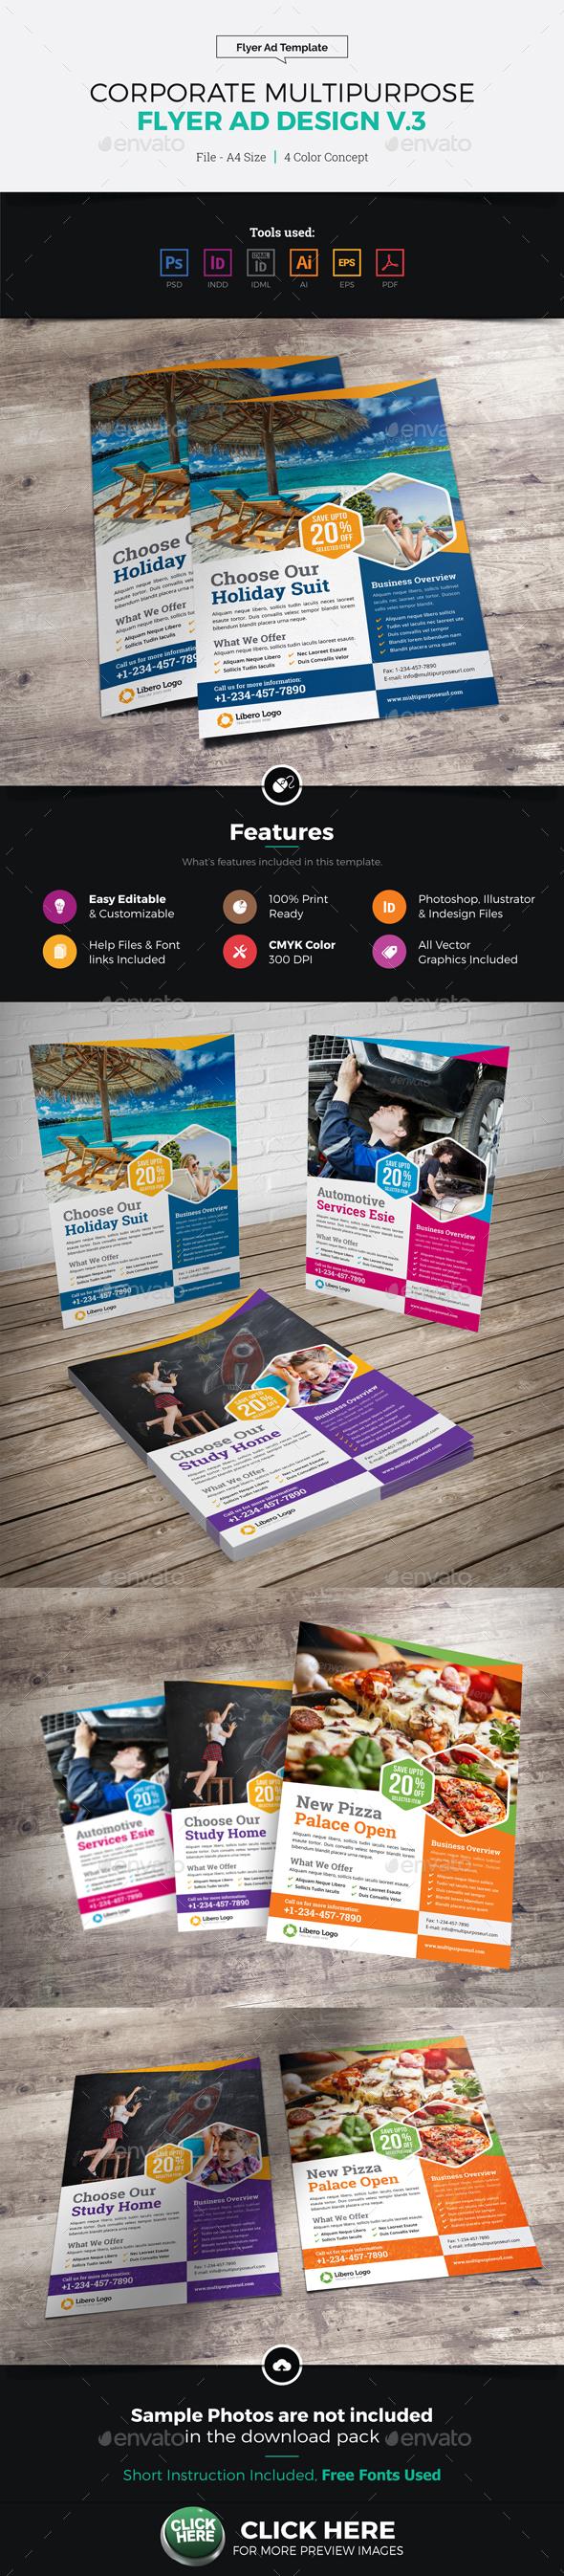 Corporate Multipurpose Flyer Ad Design v3 - Corporate Flyers